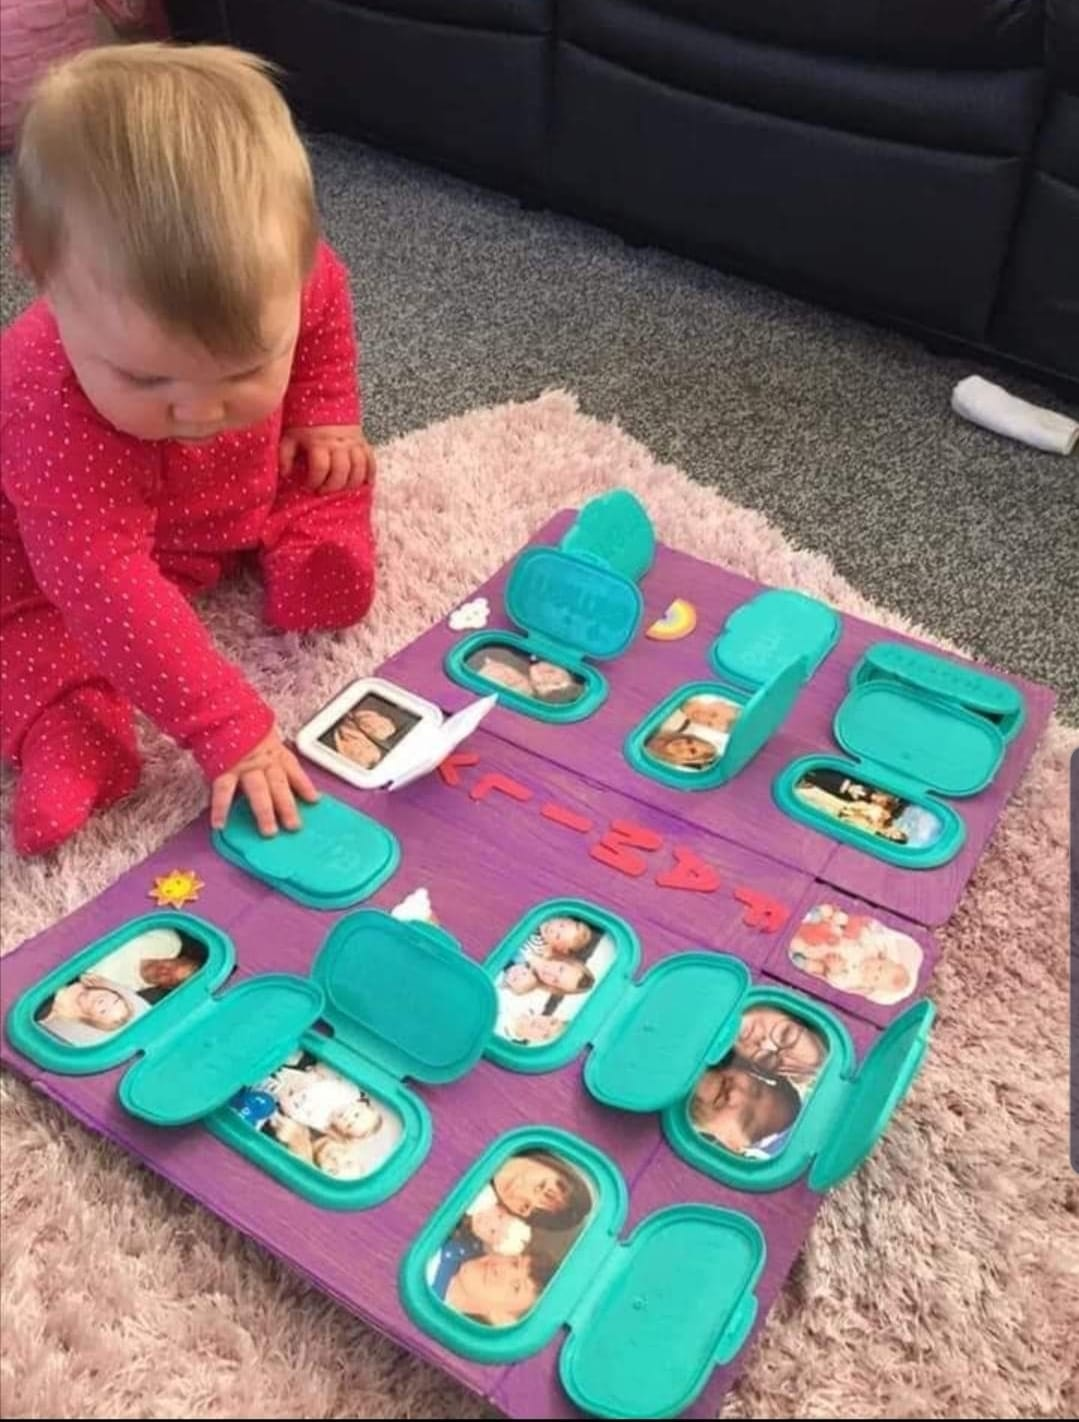 DIY Photo Board Using Baby Wipe Lids